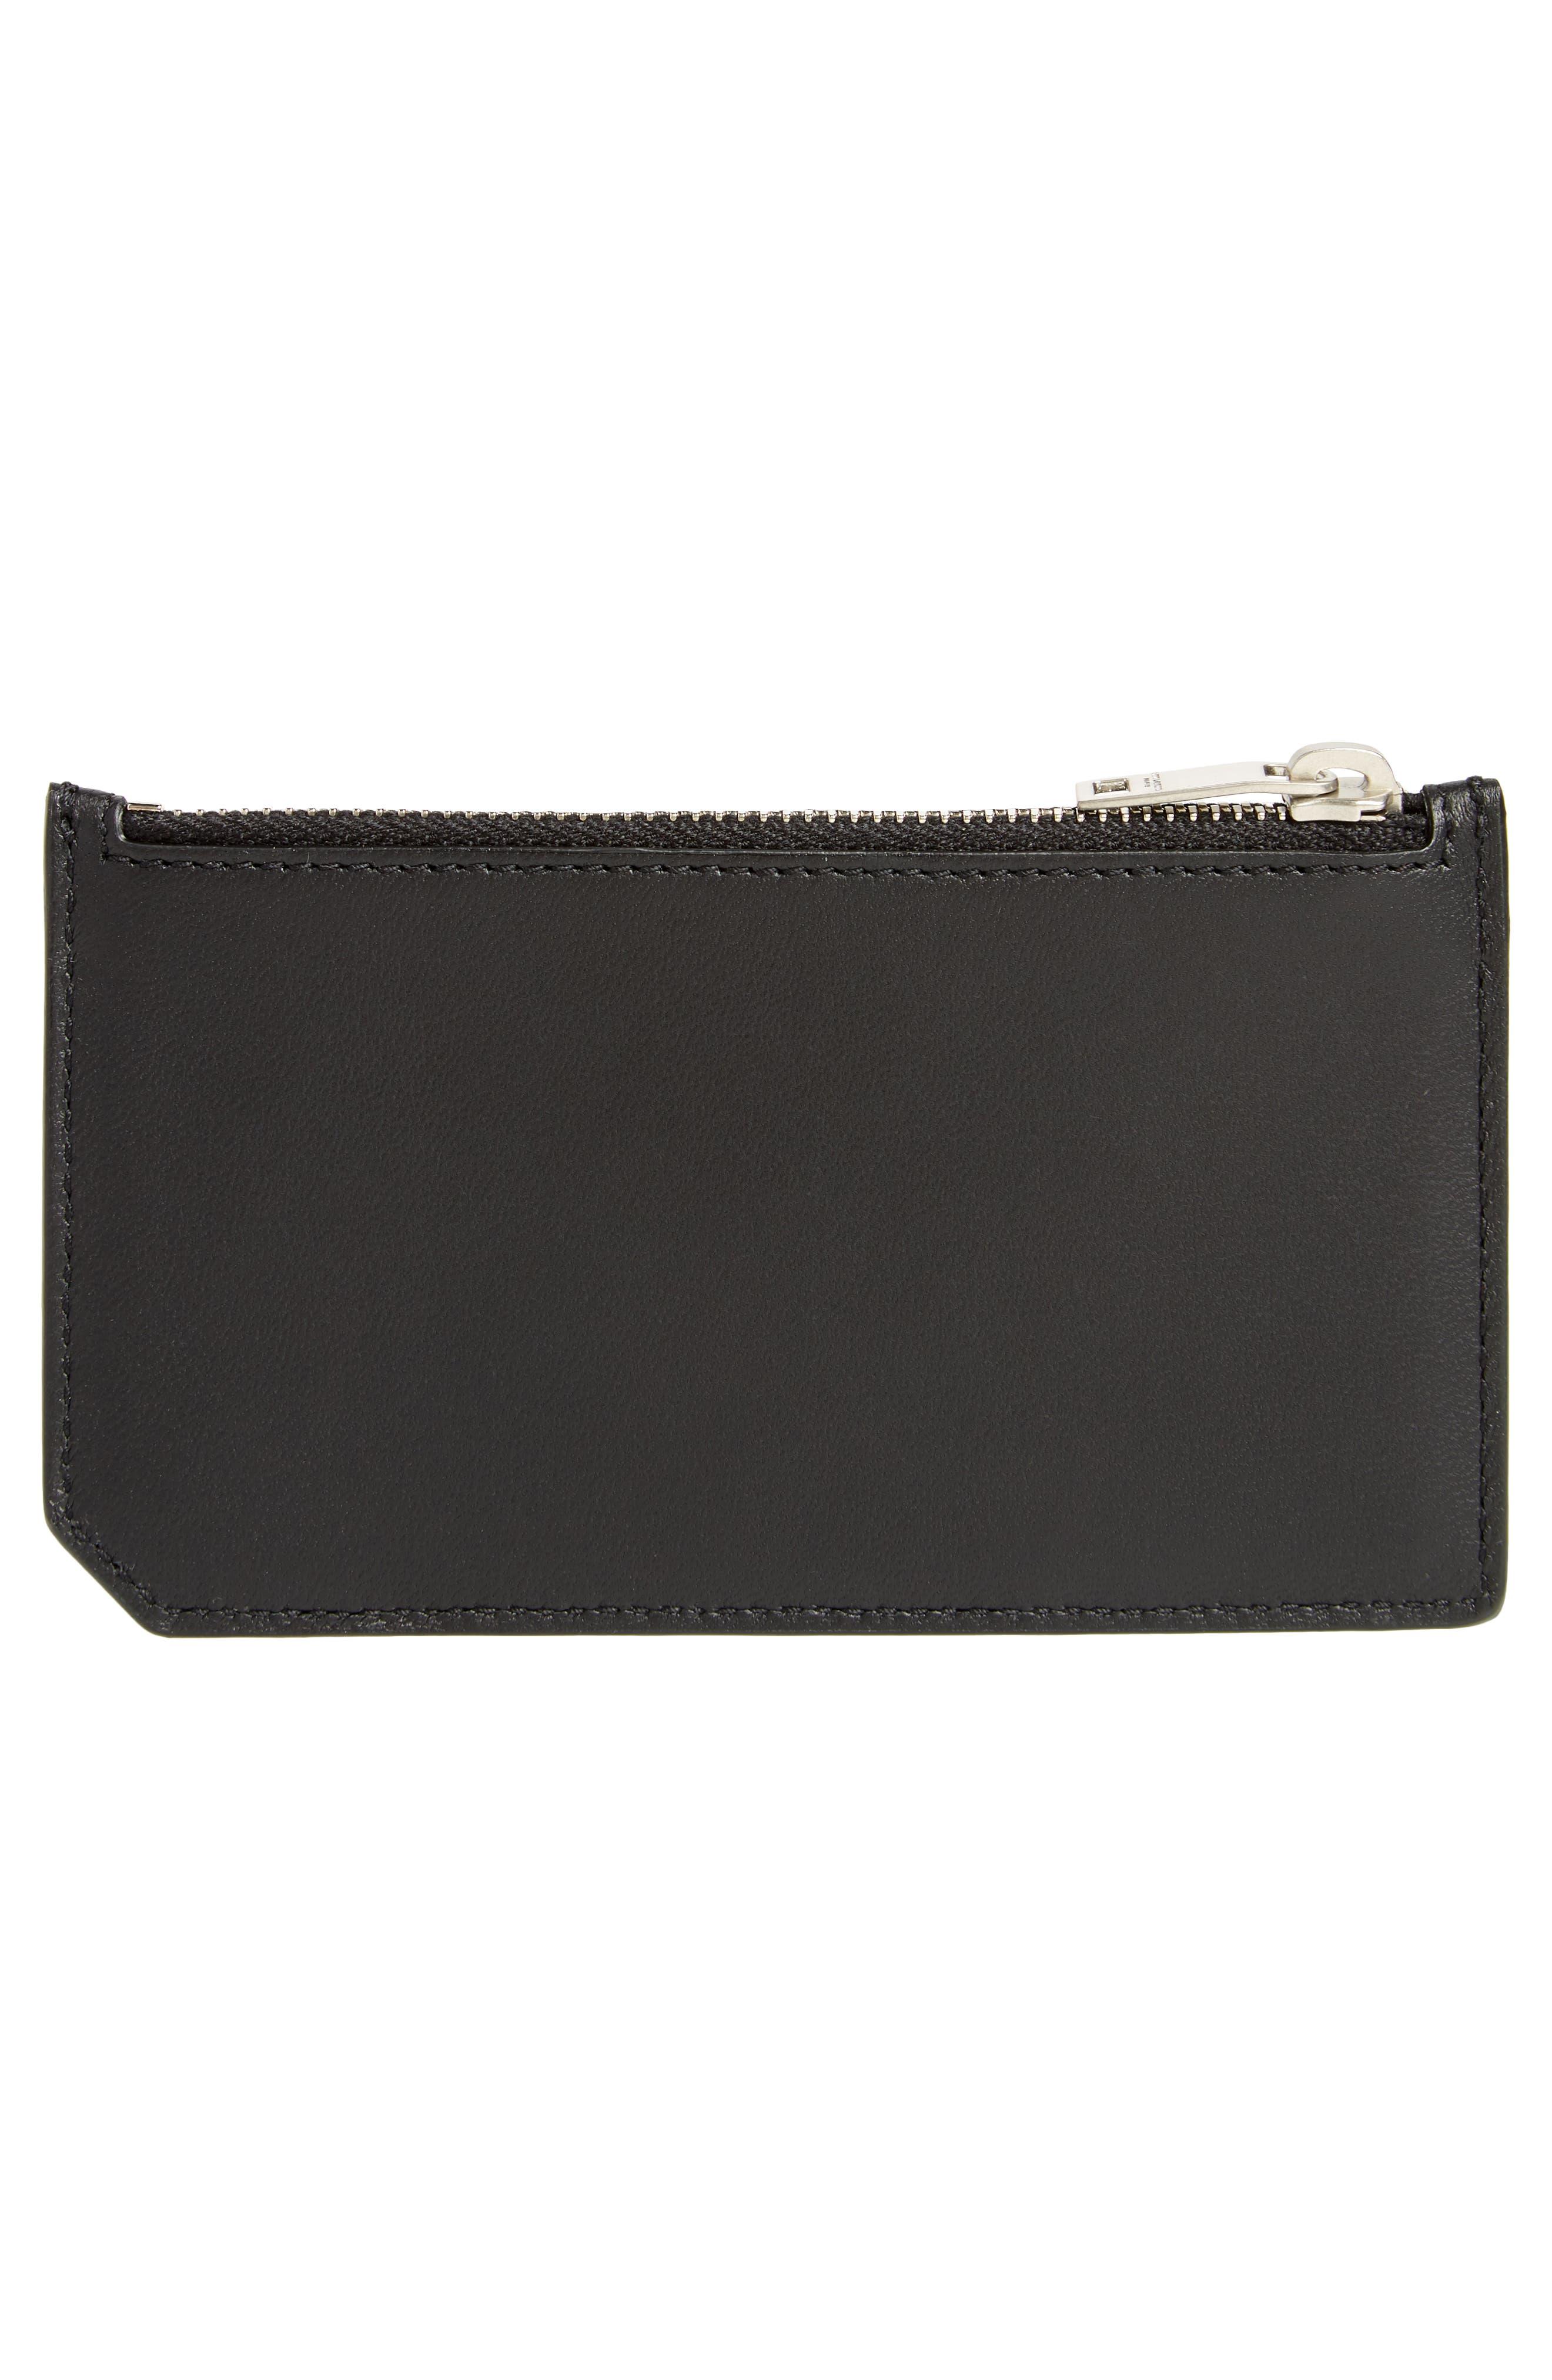 Leather Card Case,                             Alternate thumbnail 2, color,                             Black Multi